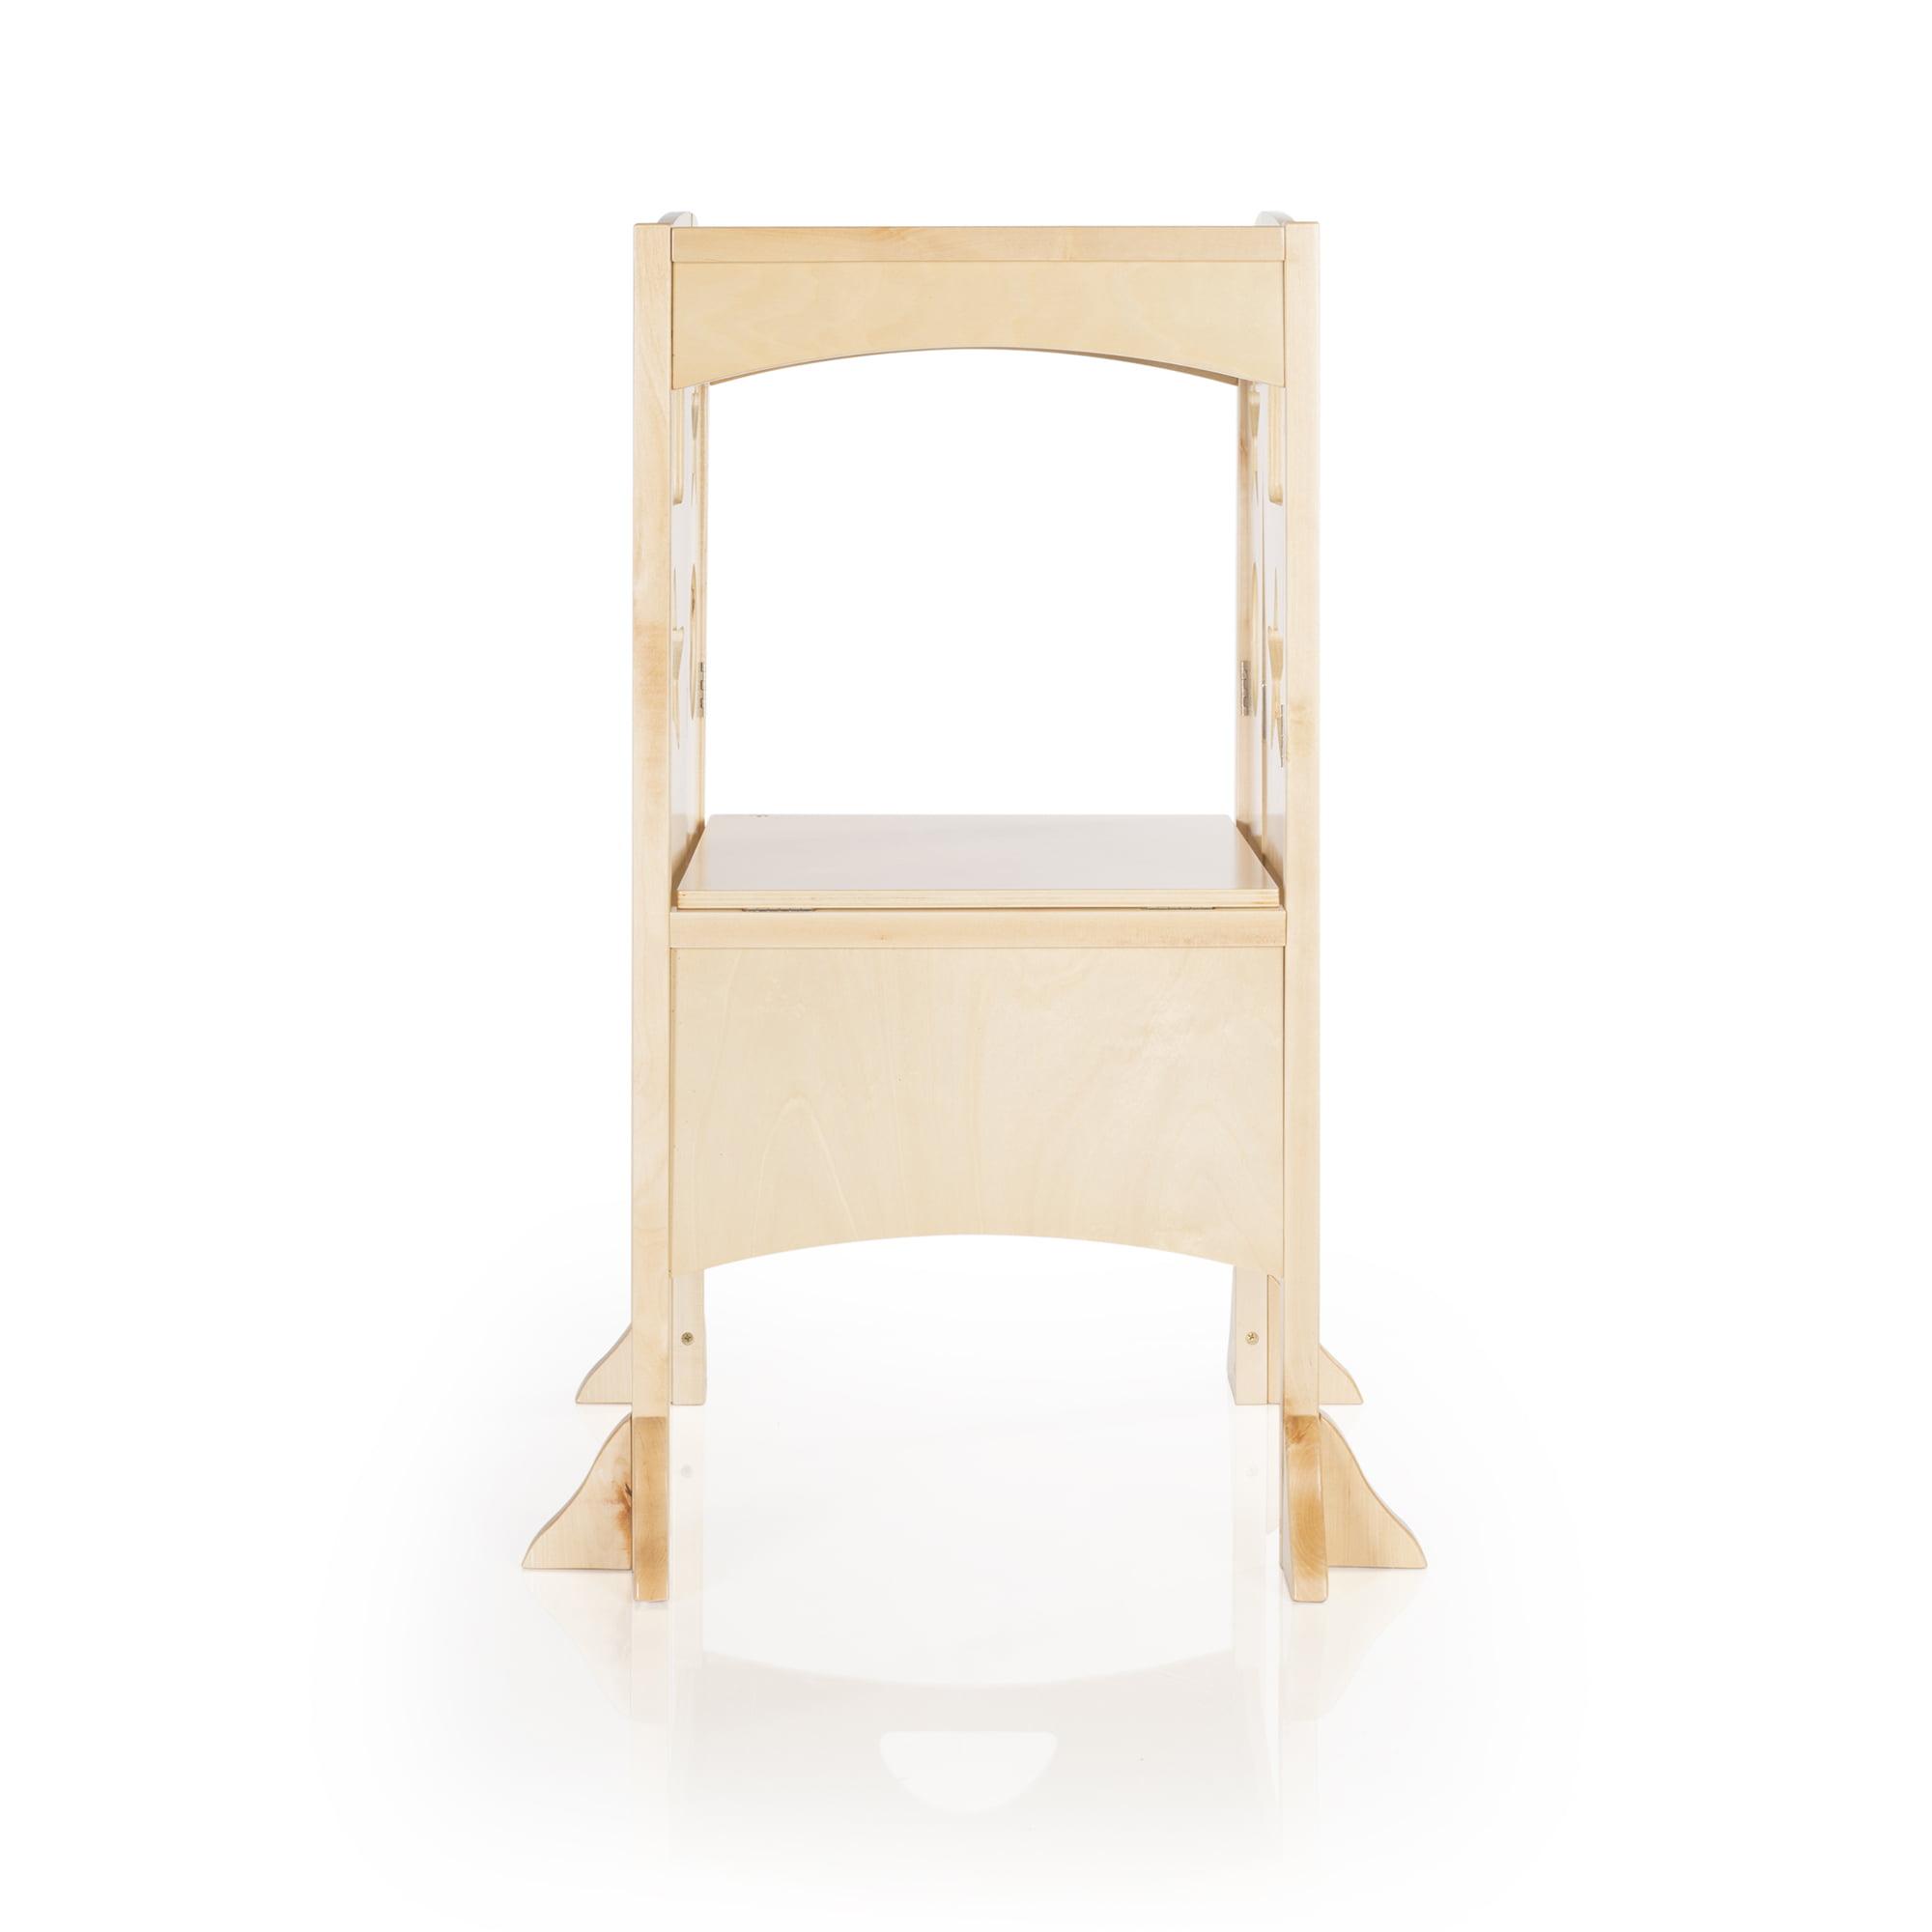 Wondrous Classic Kitchen Helper With Keeper And Non Slip Mat Spiritservingveterans Wood Chair Design Ideas Spiritservingveteransorg